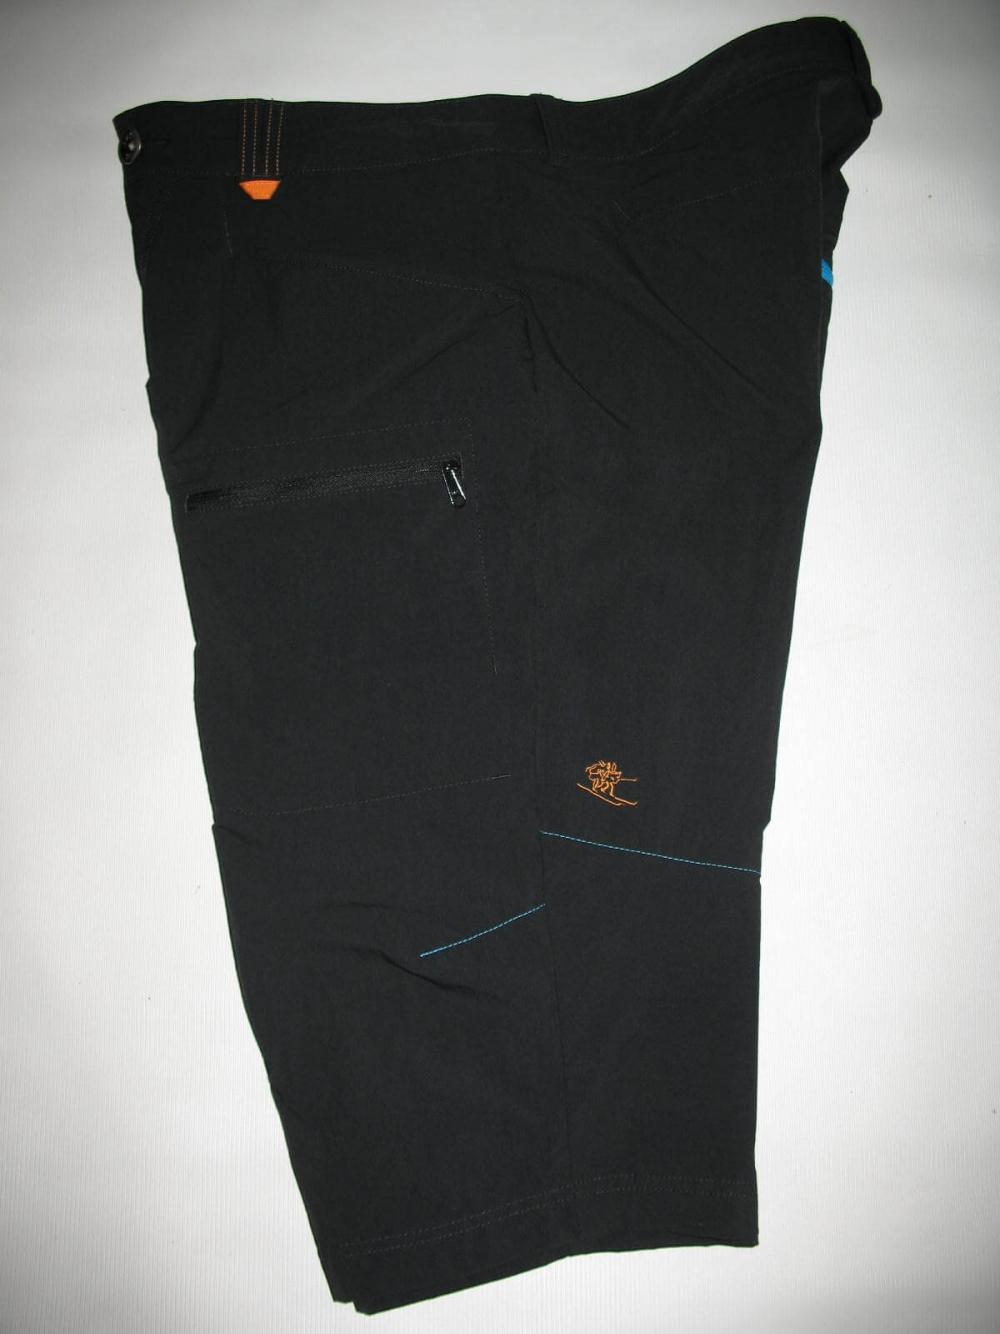 Шорты BERGANS utne pirate pants (размер L) - 4